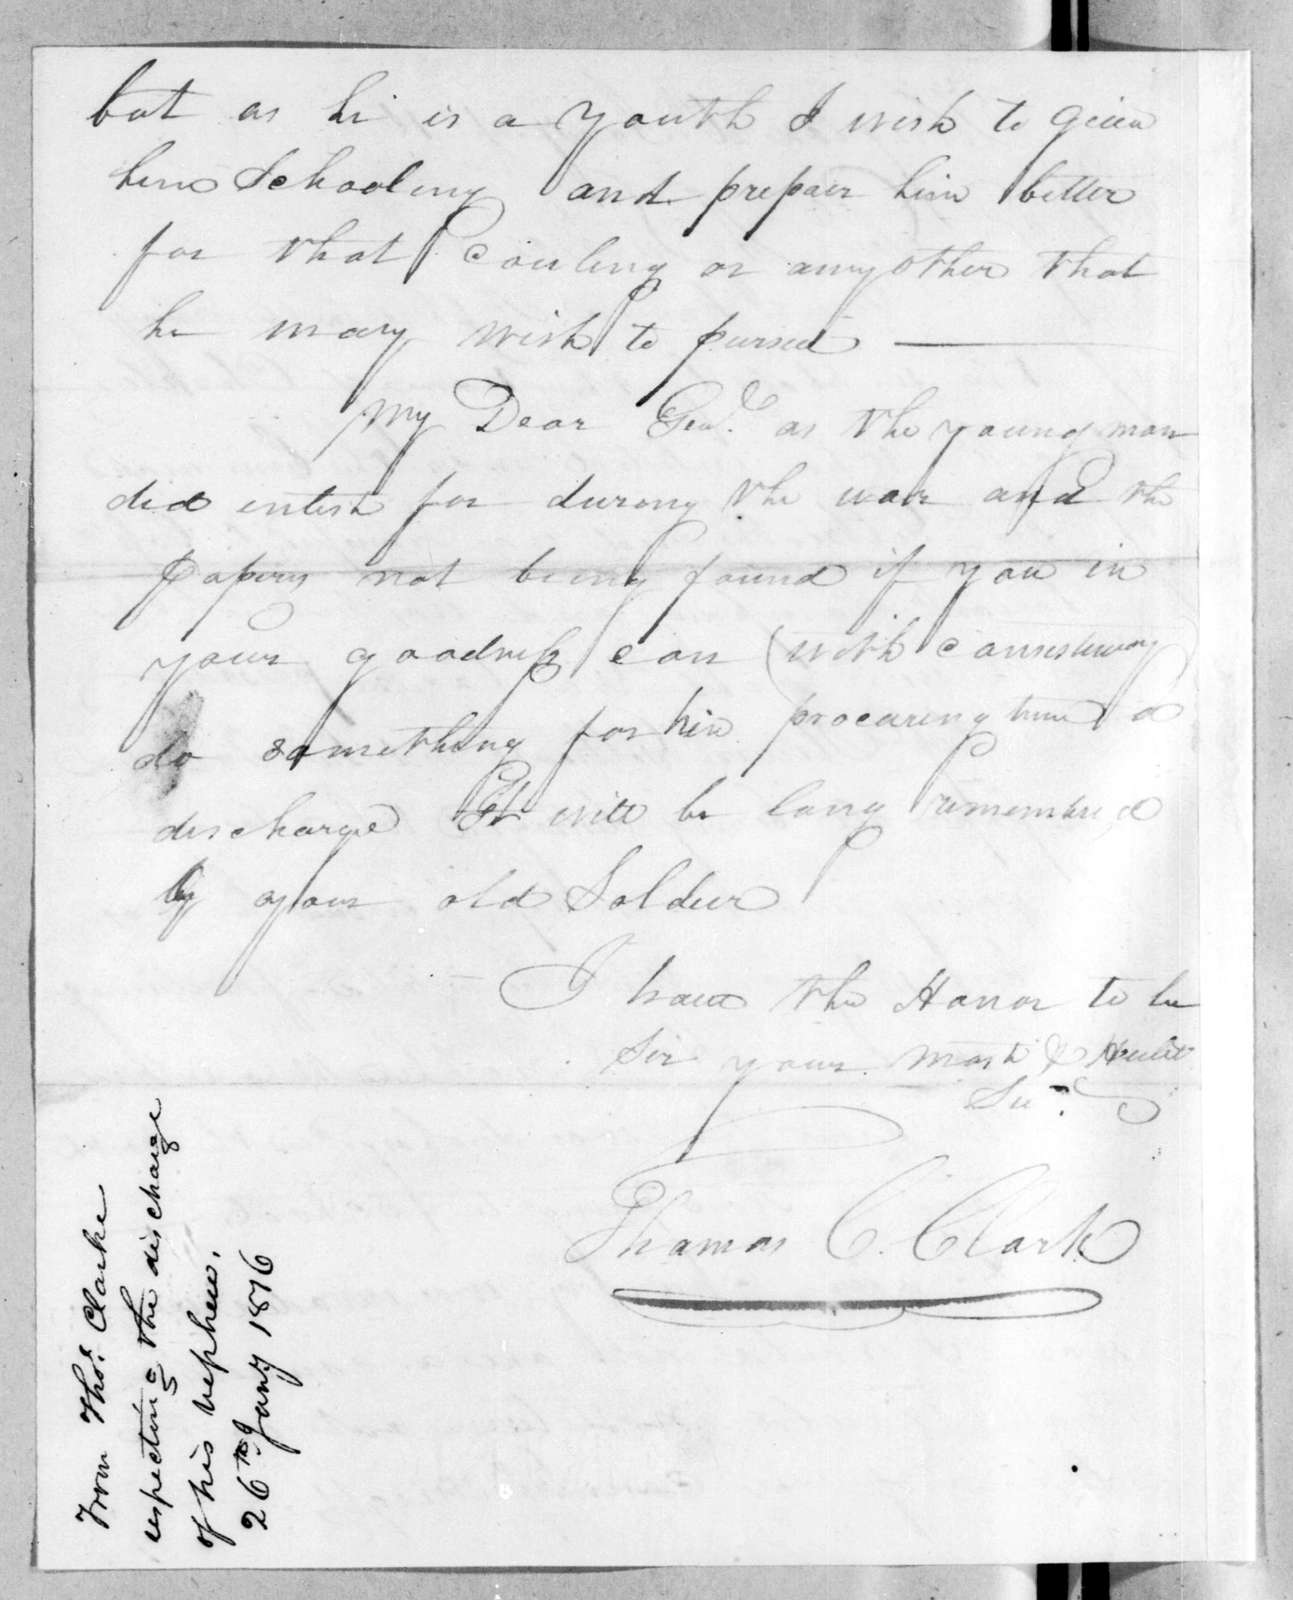 Thomas C. Clark to Andrew Jackson, January 26, 1816